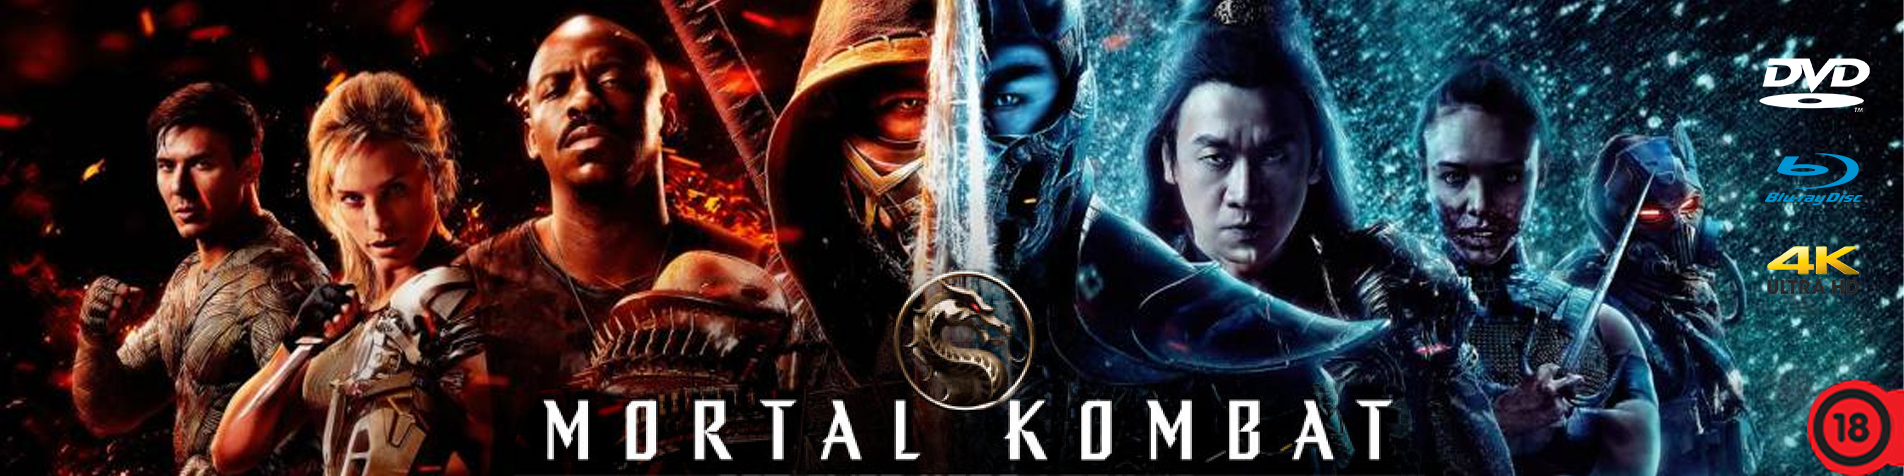 Mortal - DVD